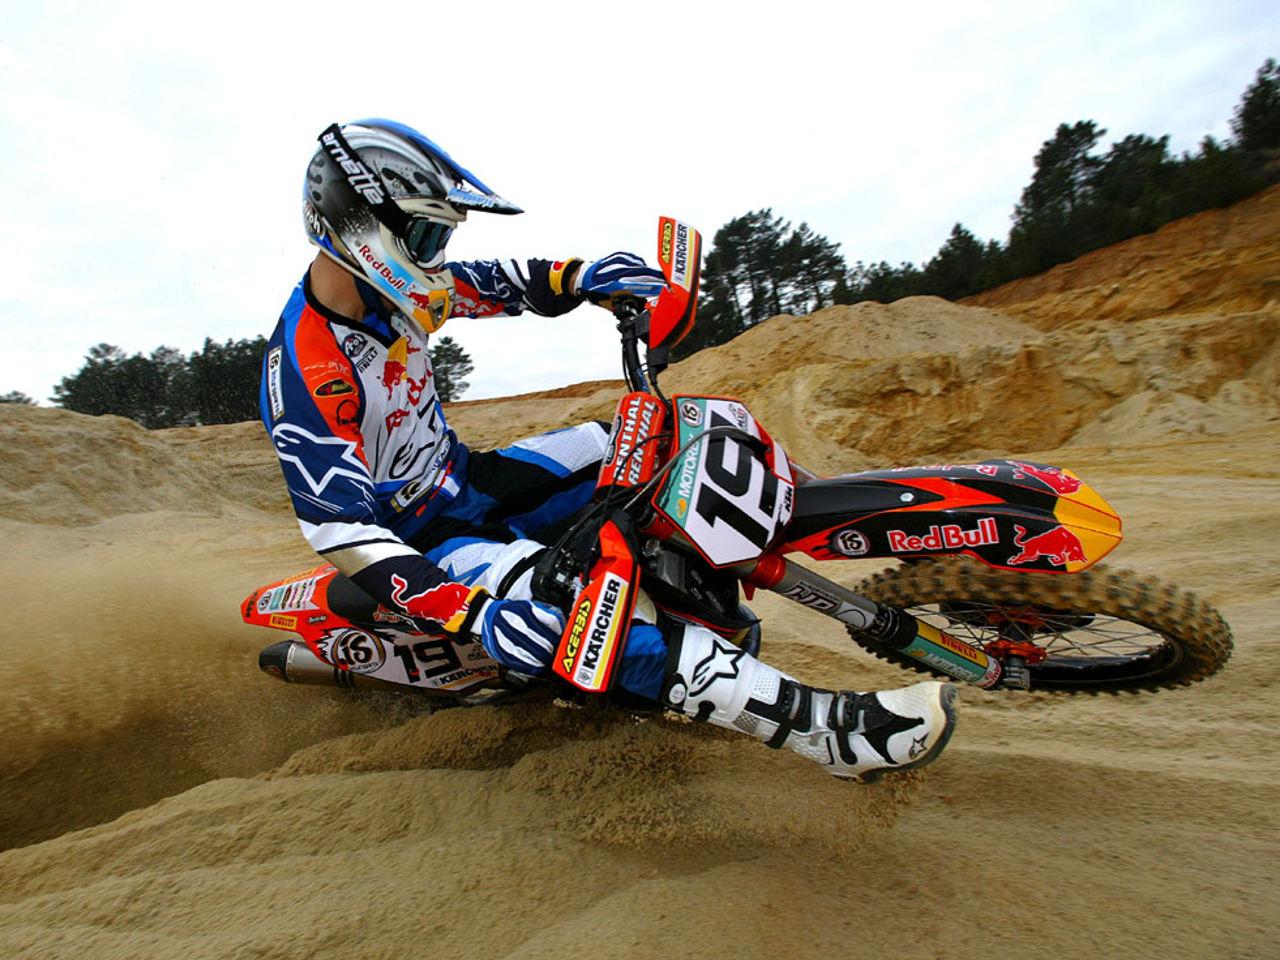 Dirt Bike Racing 6899 Hd Wallpapers in Bikes   Imagescicom 1280x960